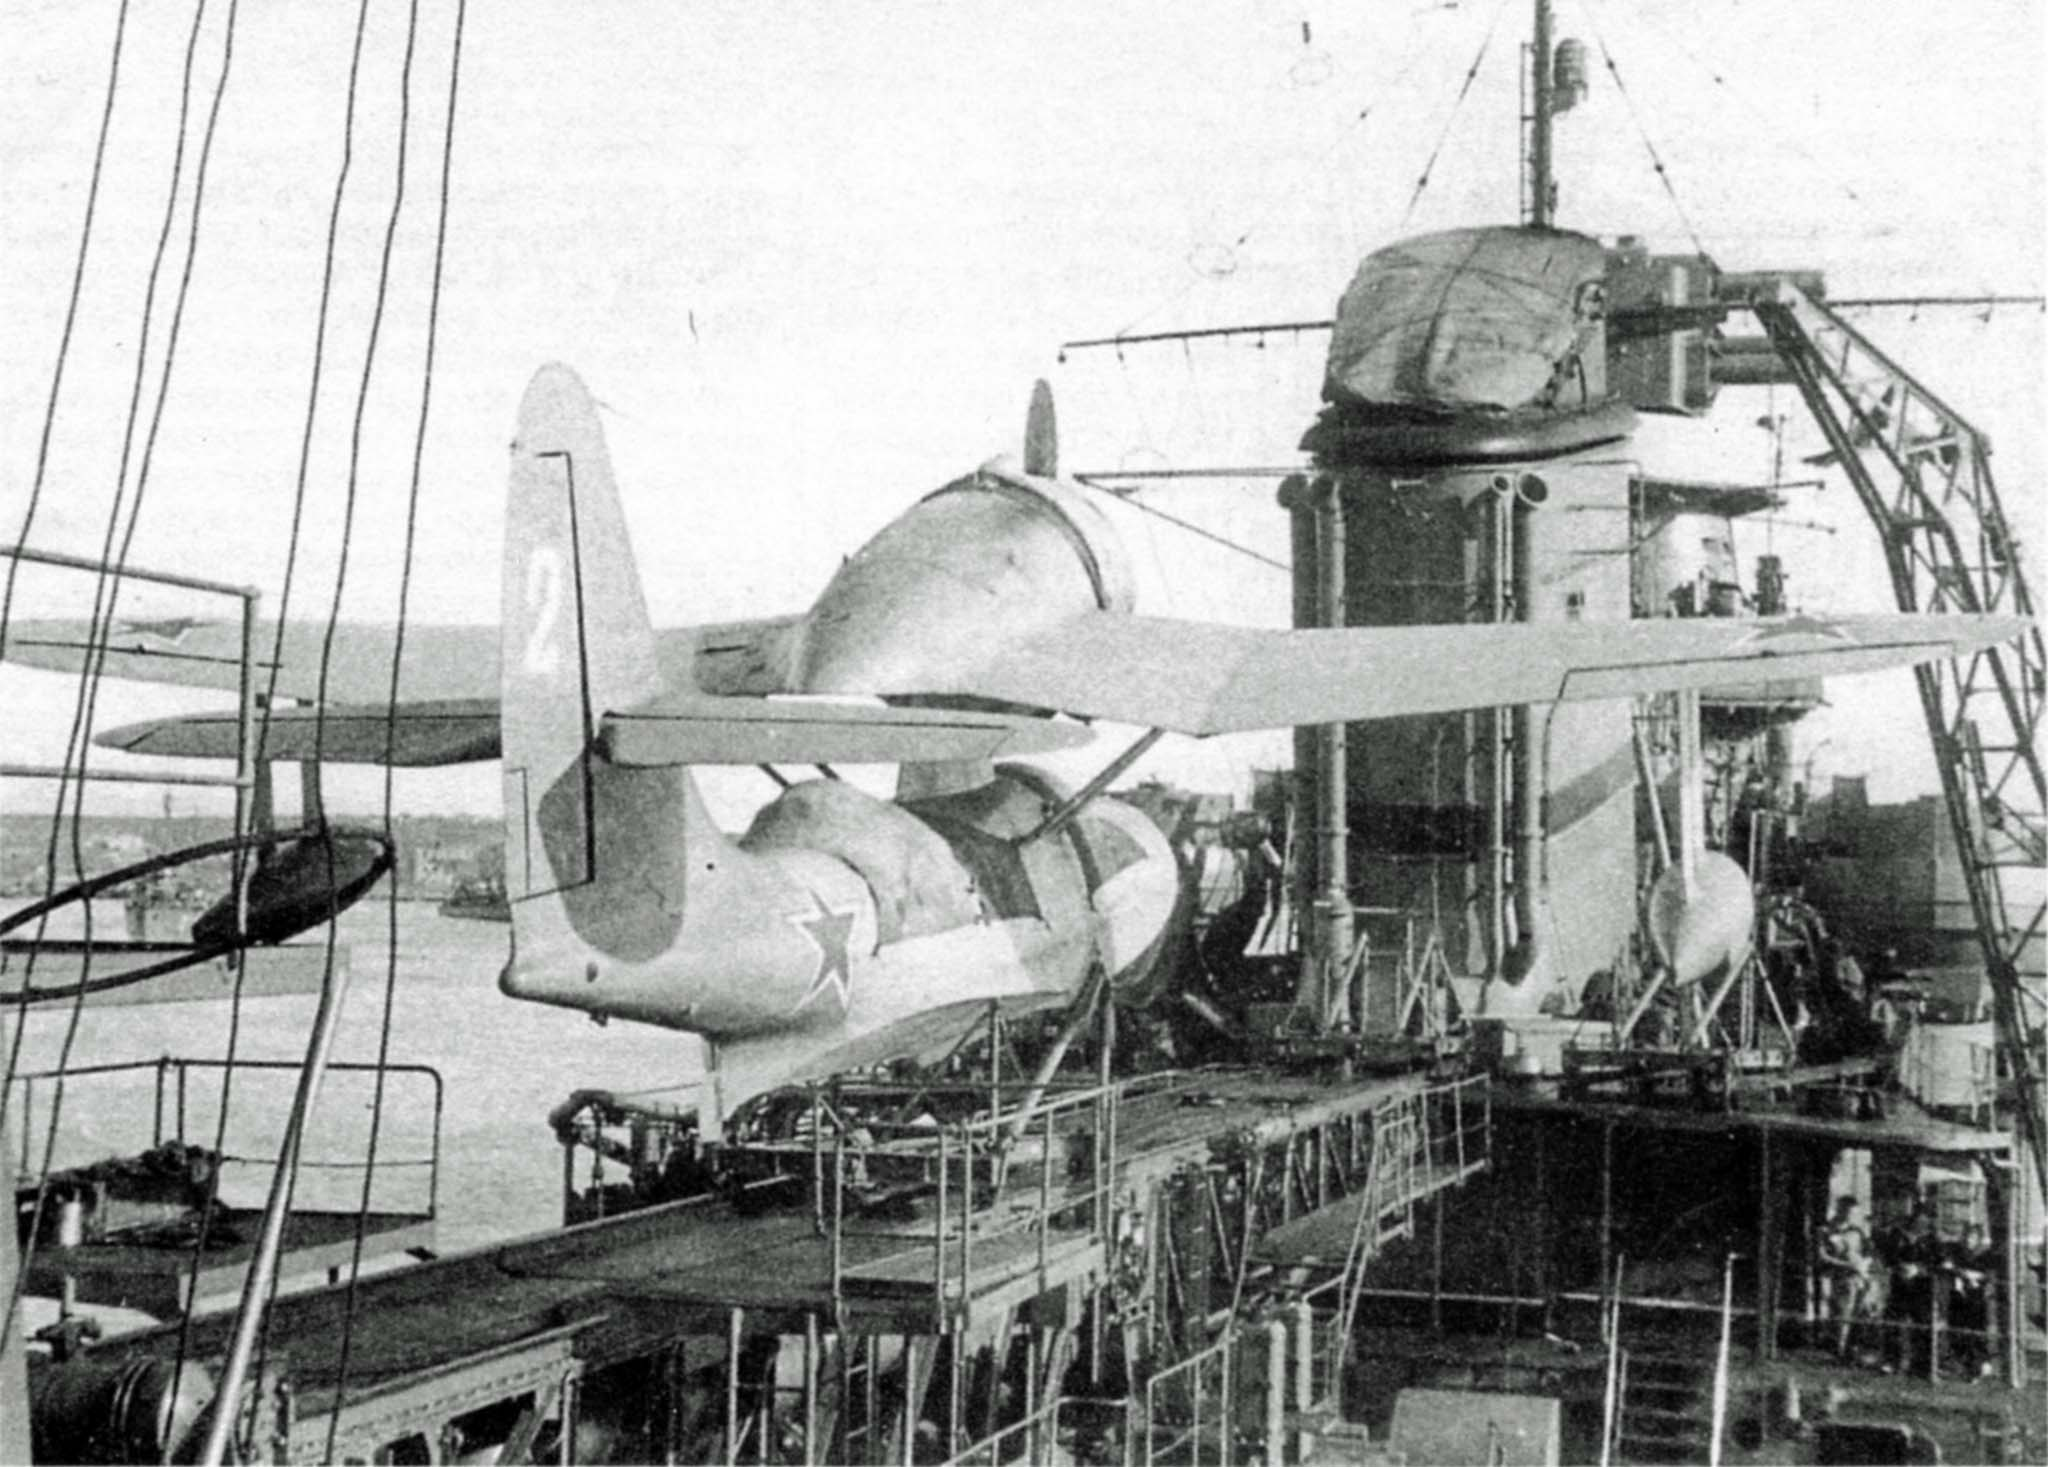 KOR-2, cruiser Molotov